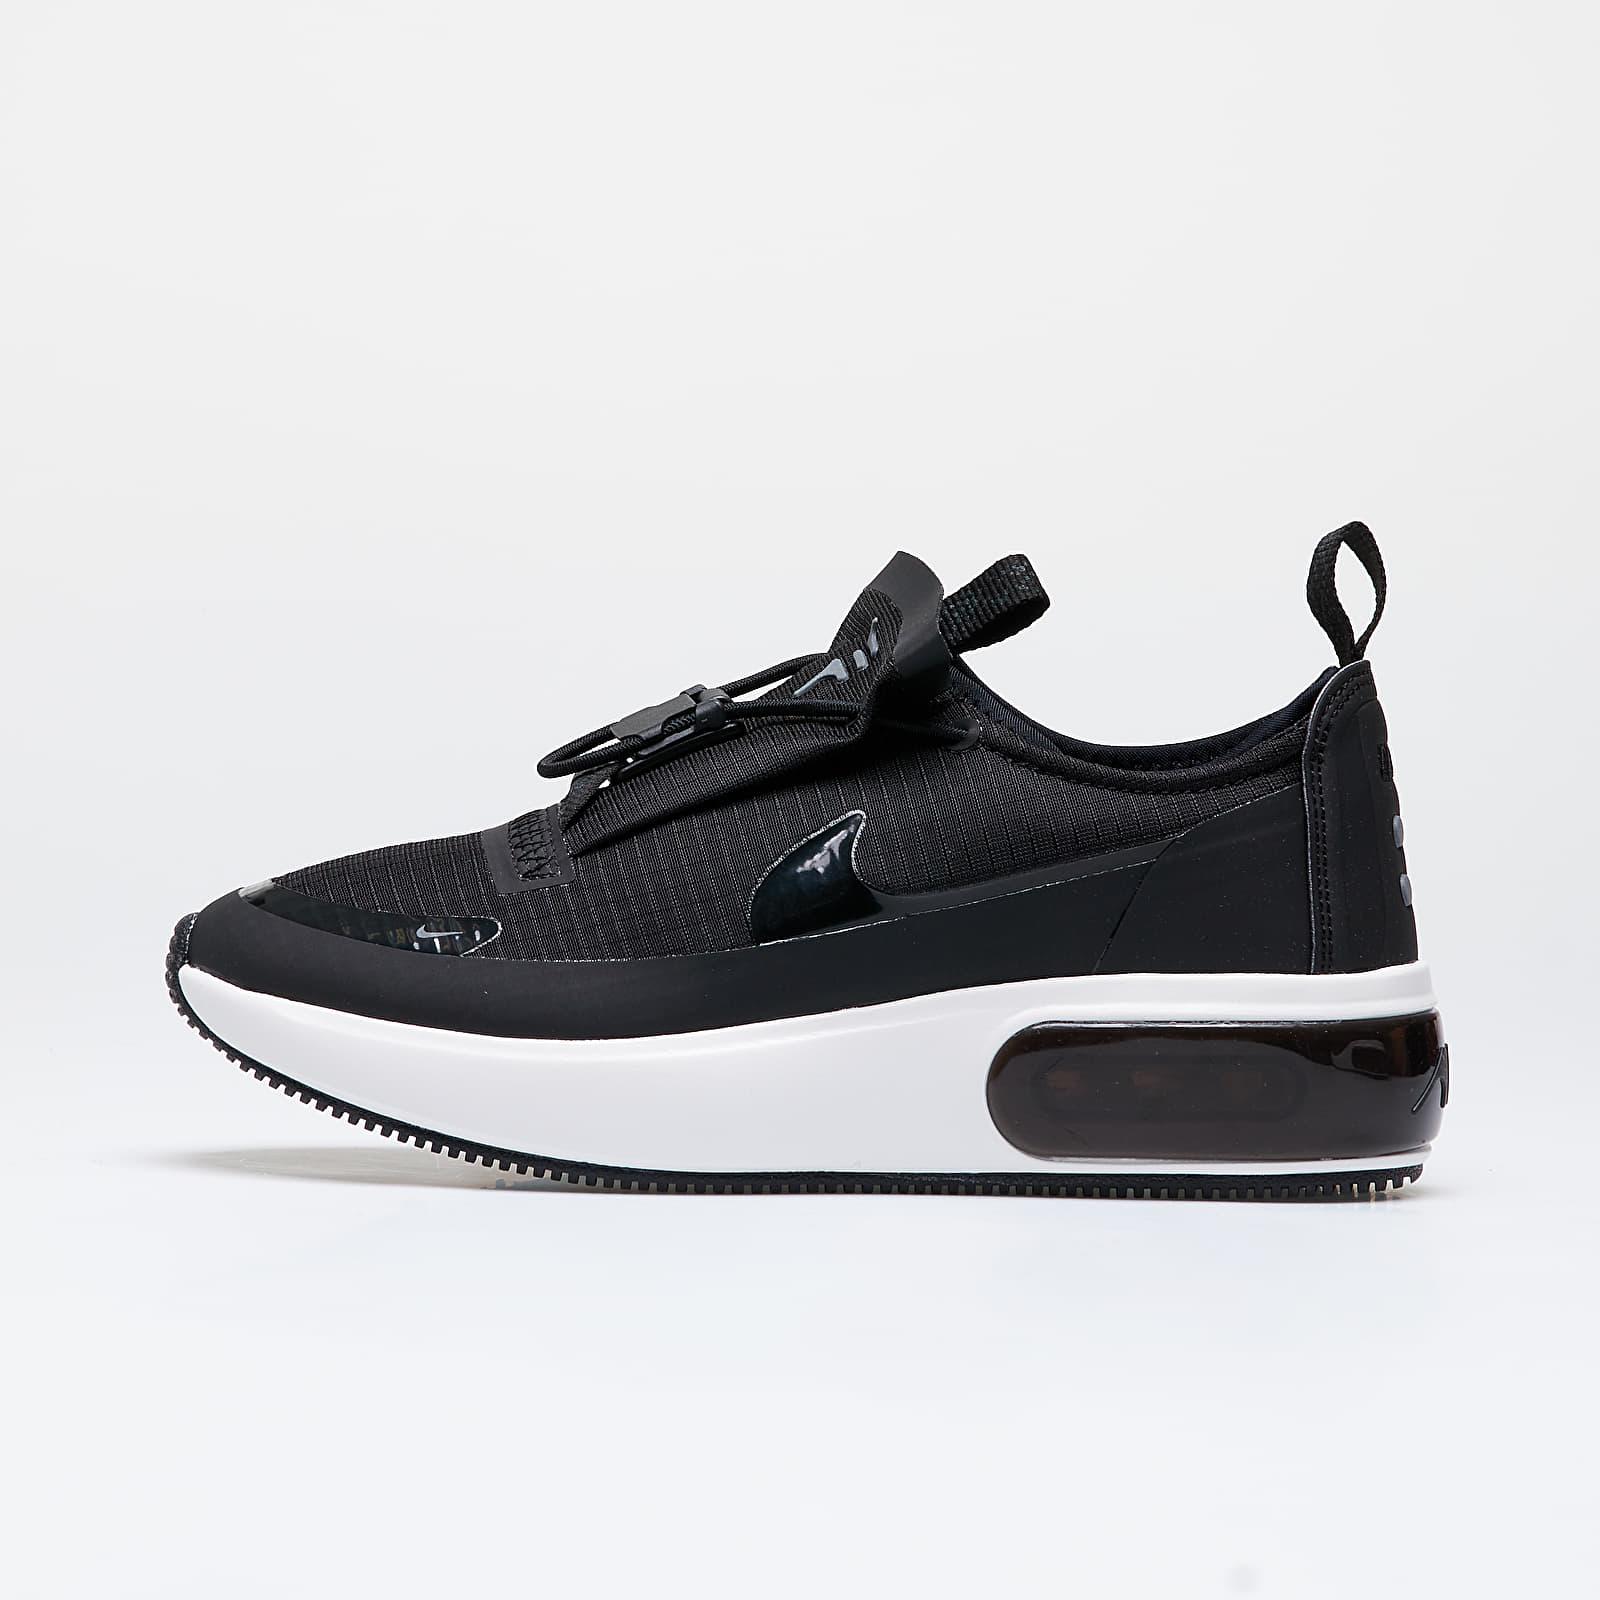 Dámské tenisky a boty Nike W Air Max Dia Winter Black/ Black-Anthracite-Summit White